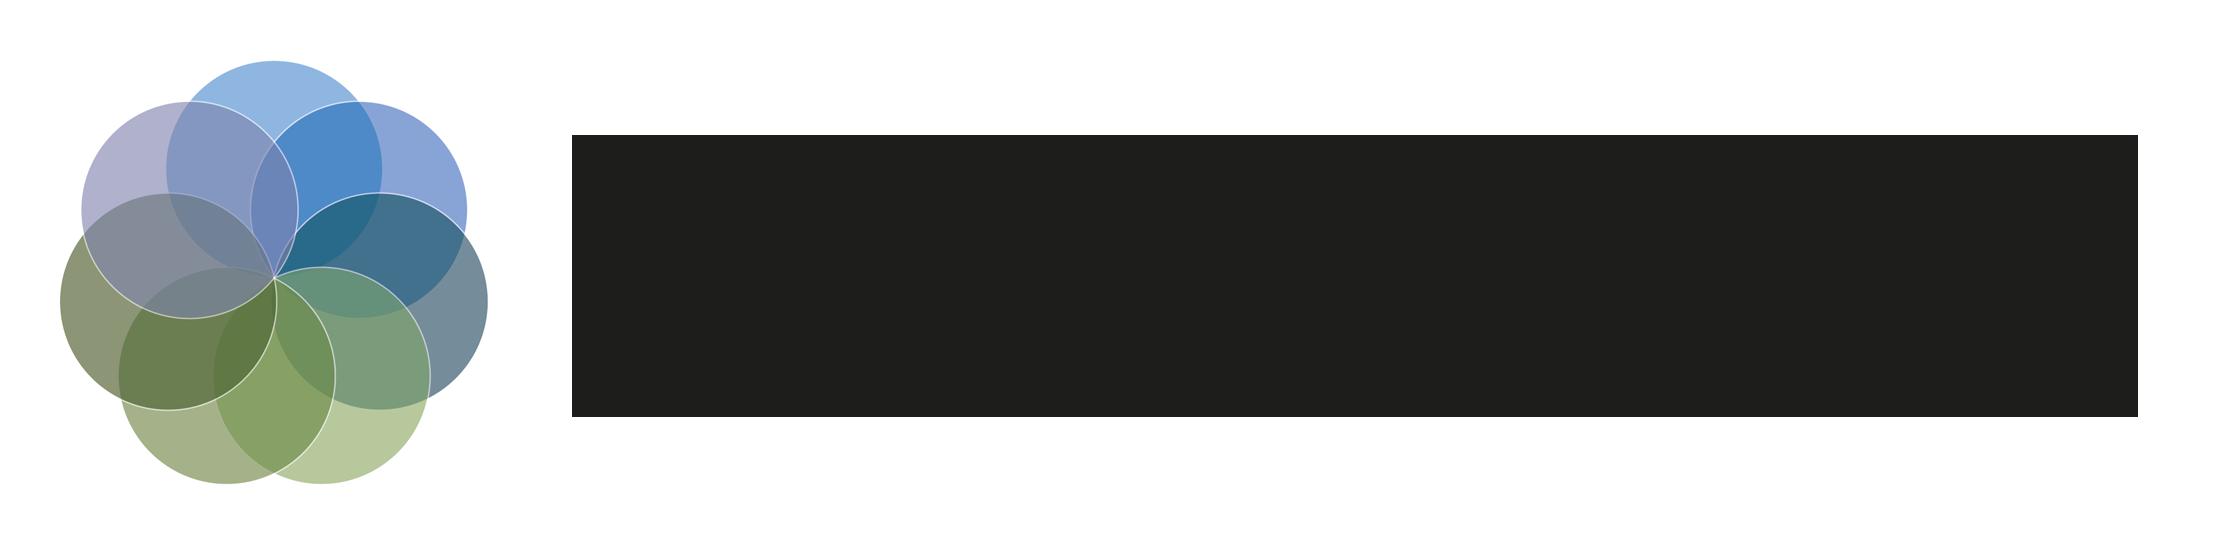 Evopäd Hannelore Köppl Alfaia